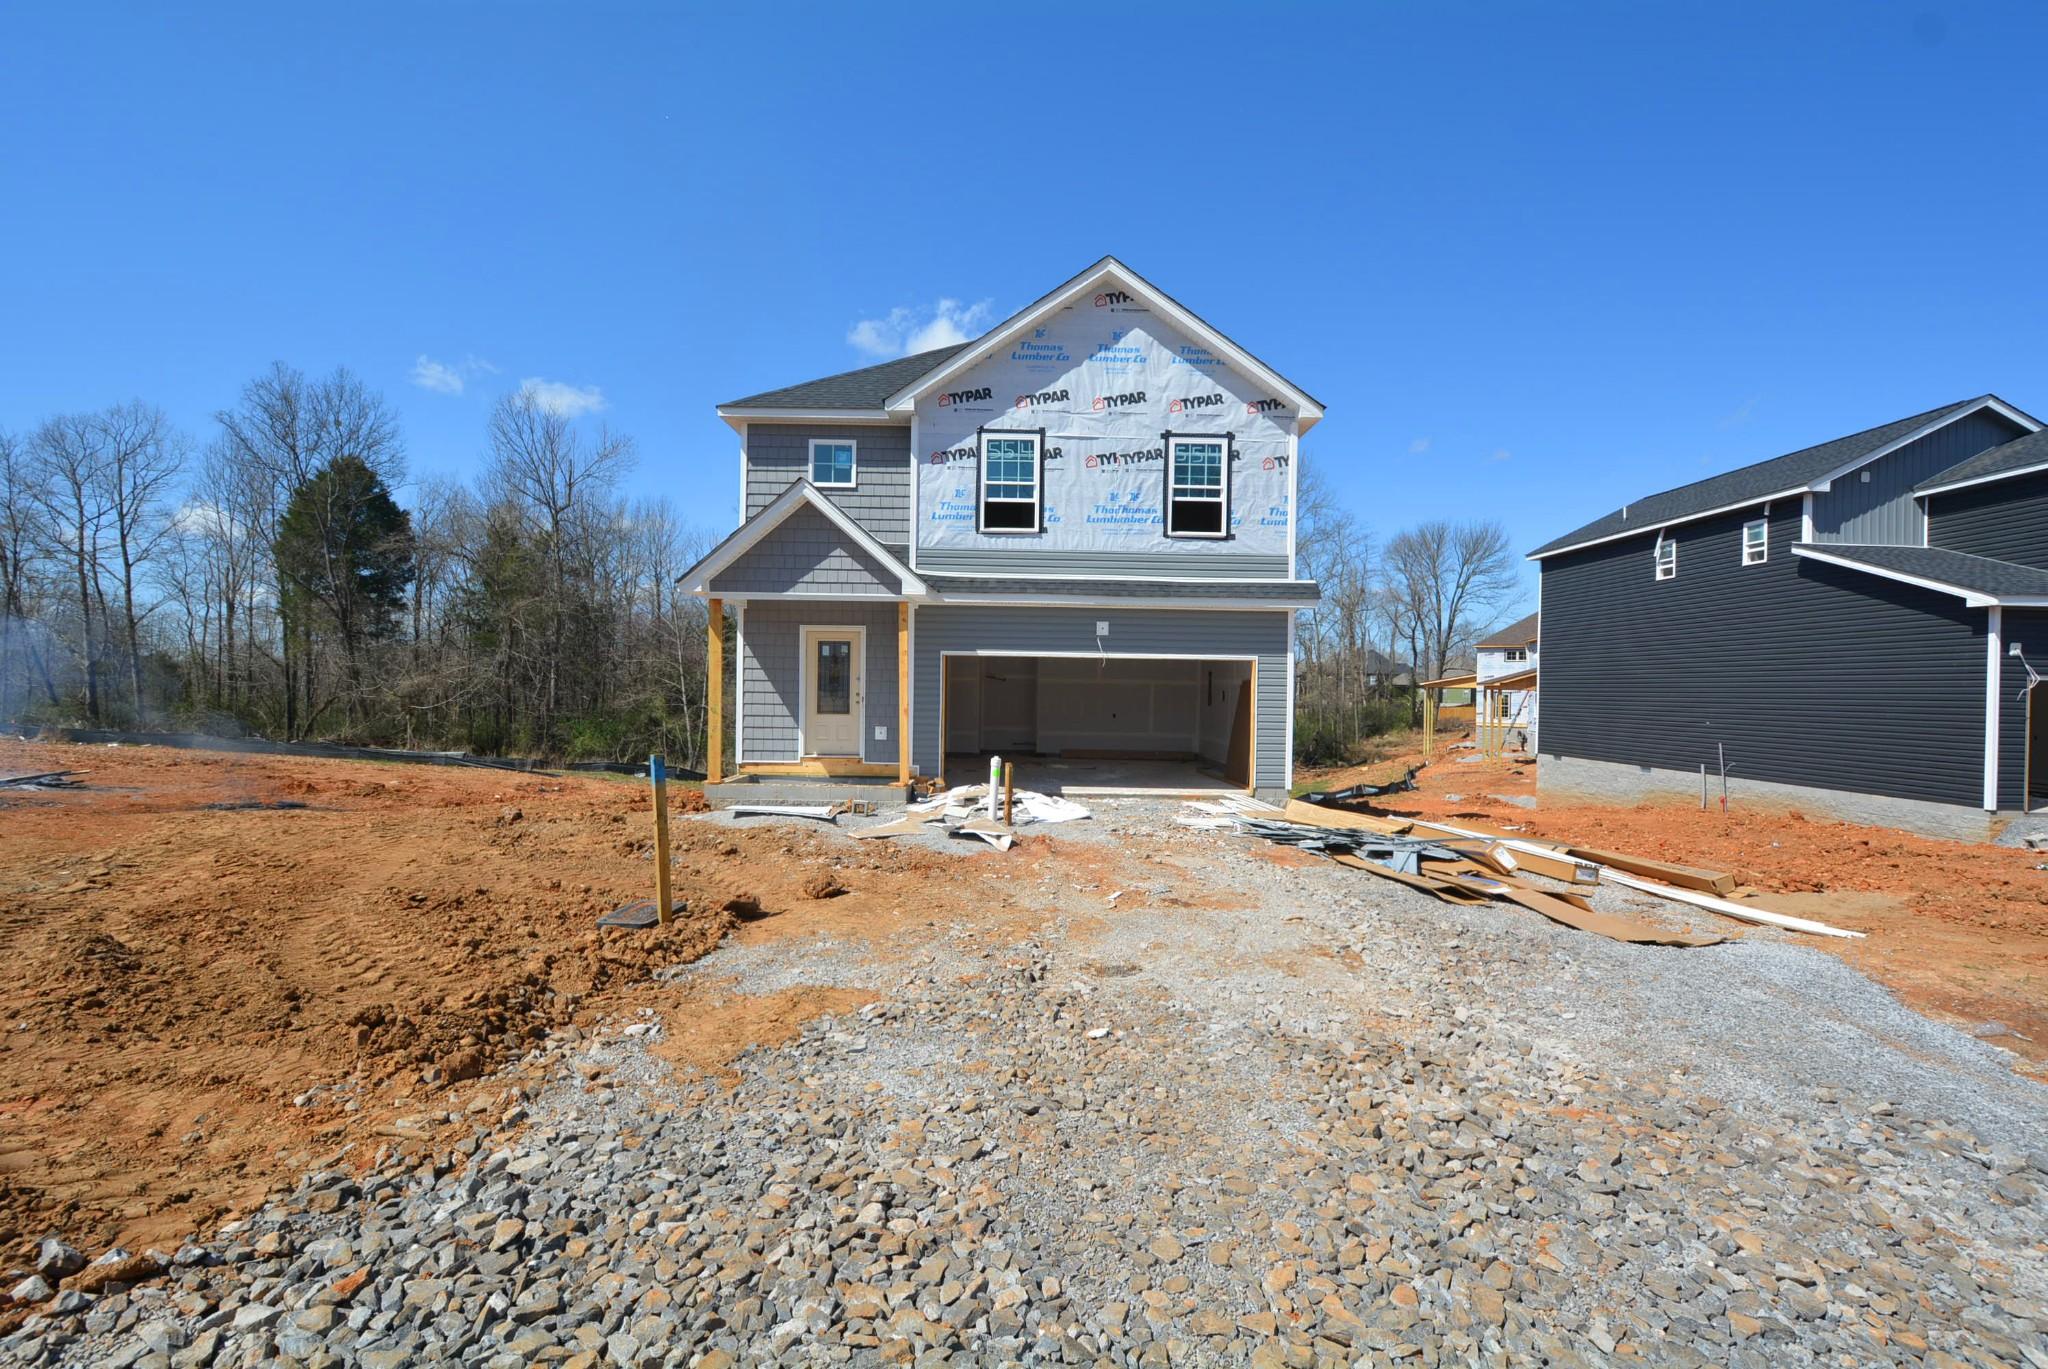 554 Autumn Creek Property Photo - Clarksville, TN real estate listing